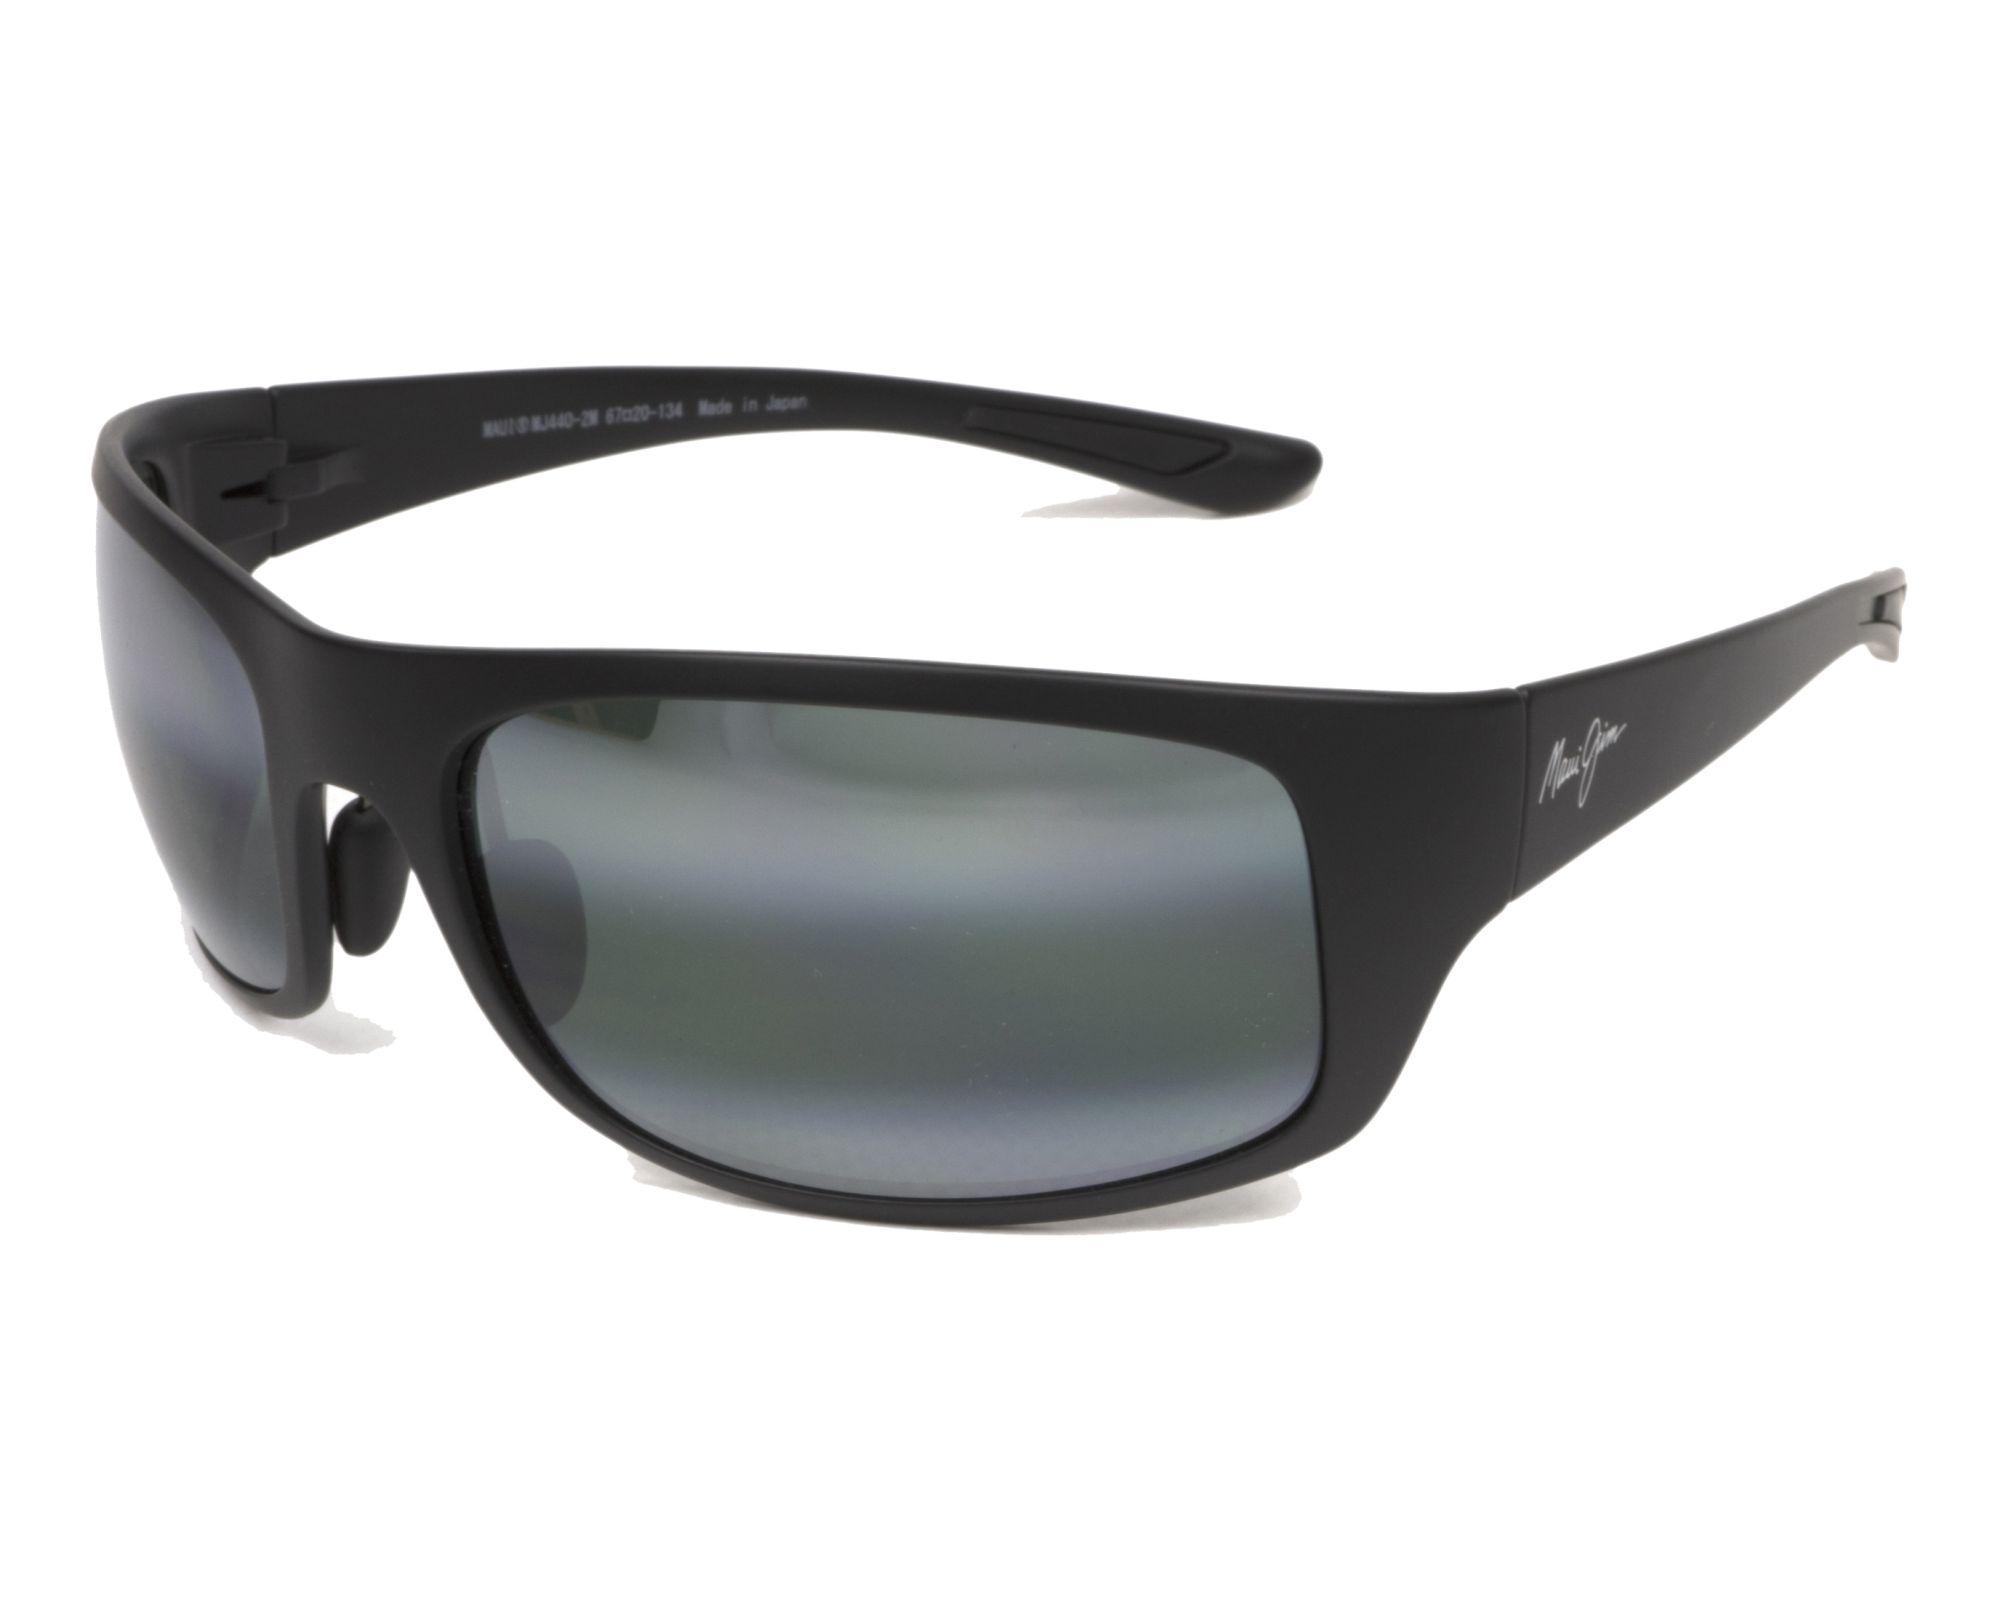 ee0b986ad44 Polarized. Sunglasses Maui Jim 440 2M 67-20 Black profile view